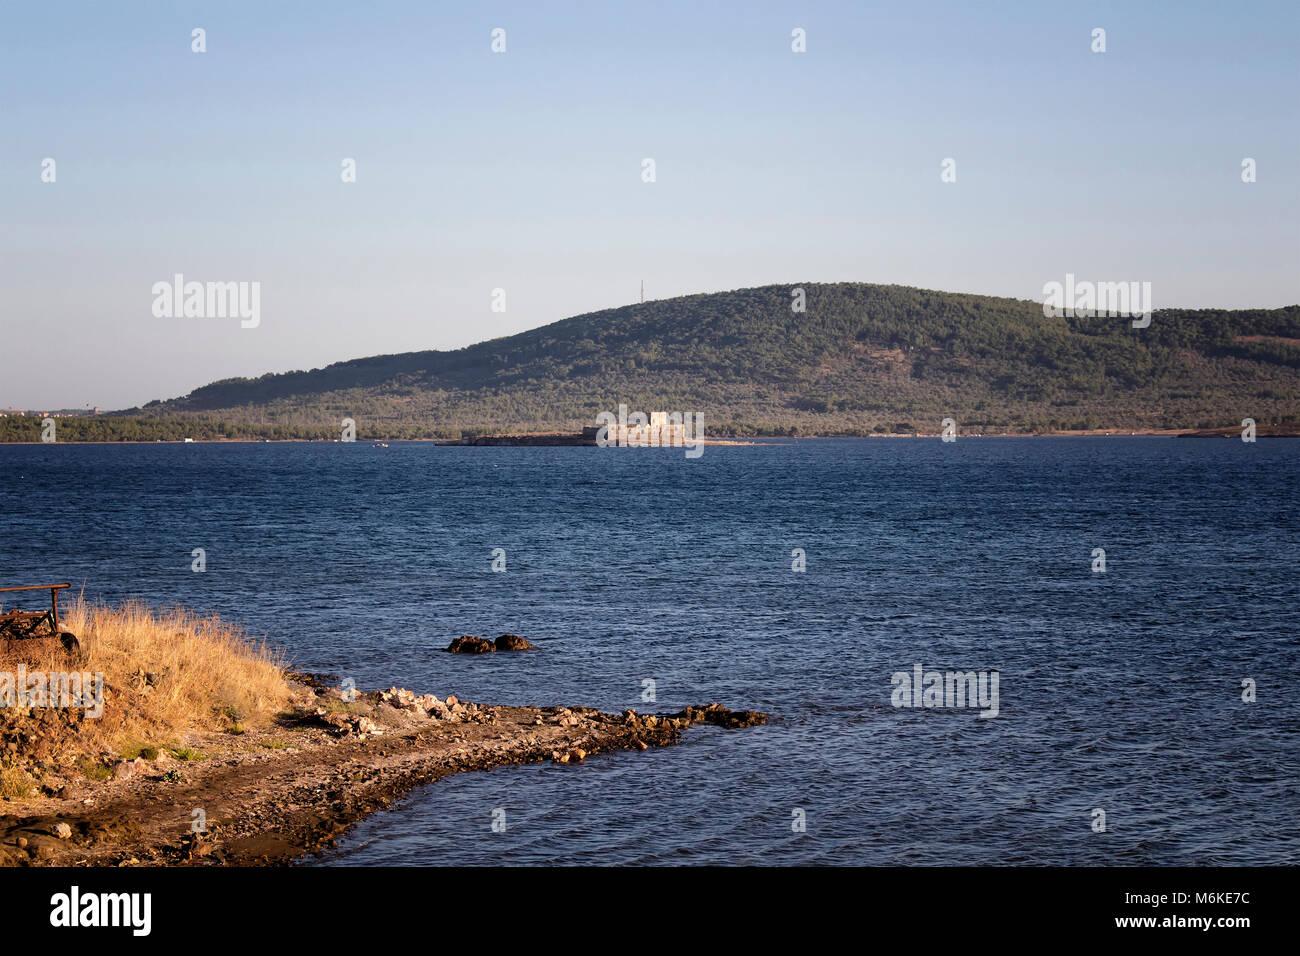 View of Aegean sea and landscape in Cunda (Alibey) island. - Stock Image